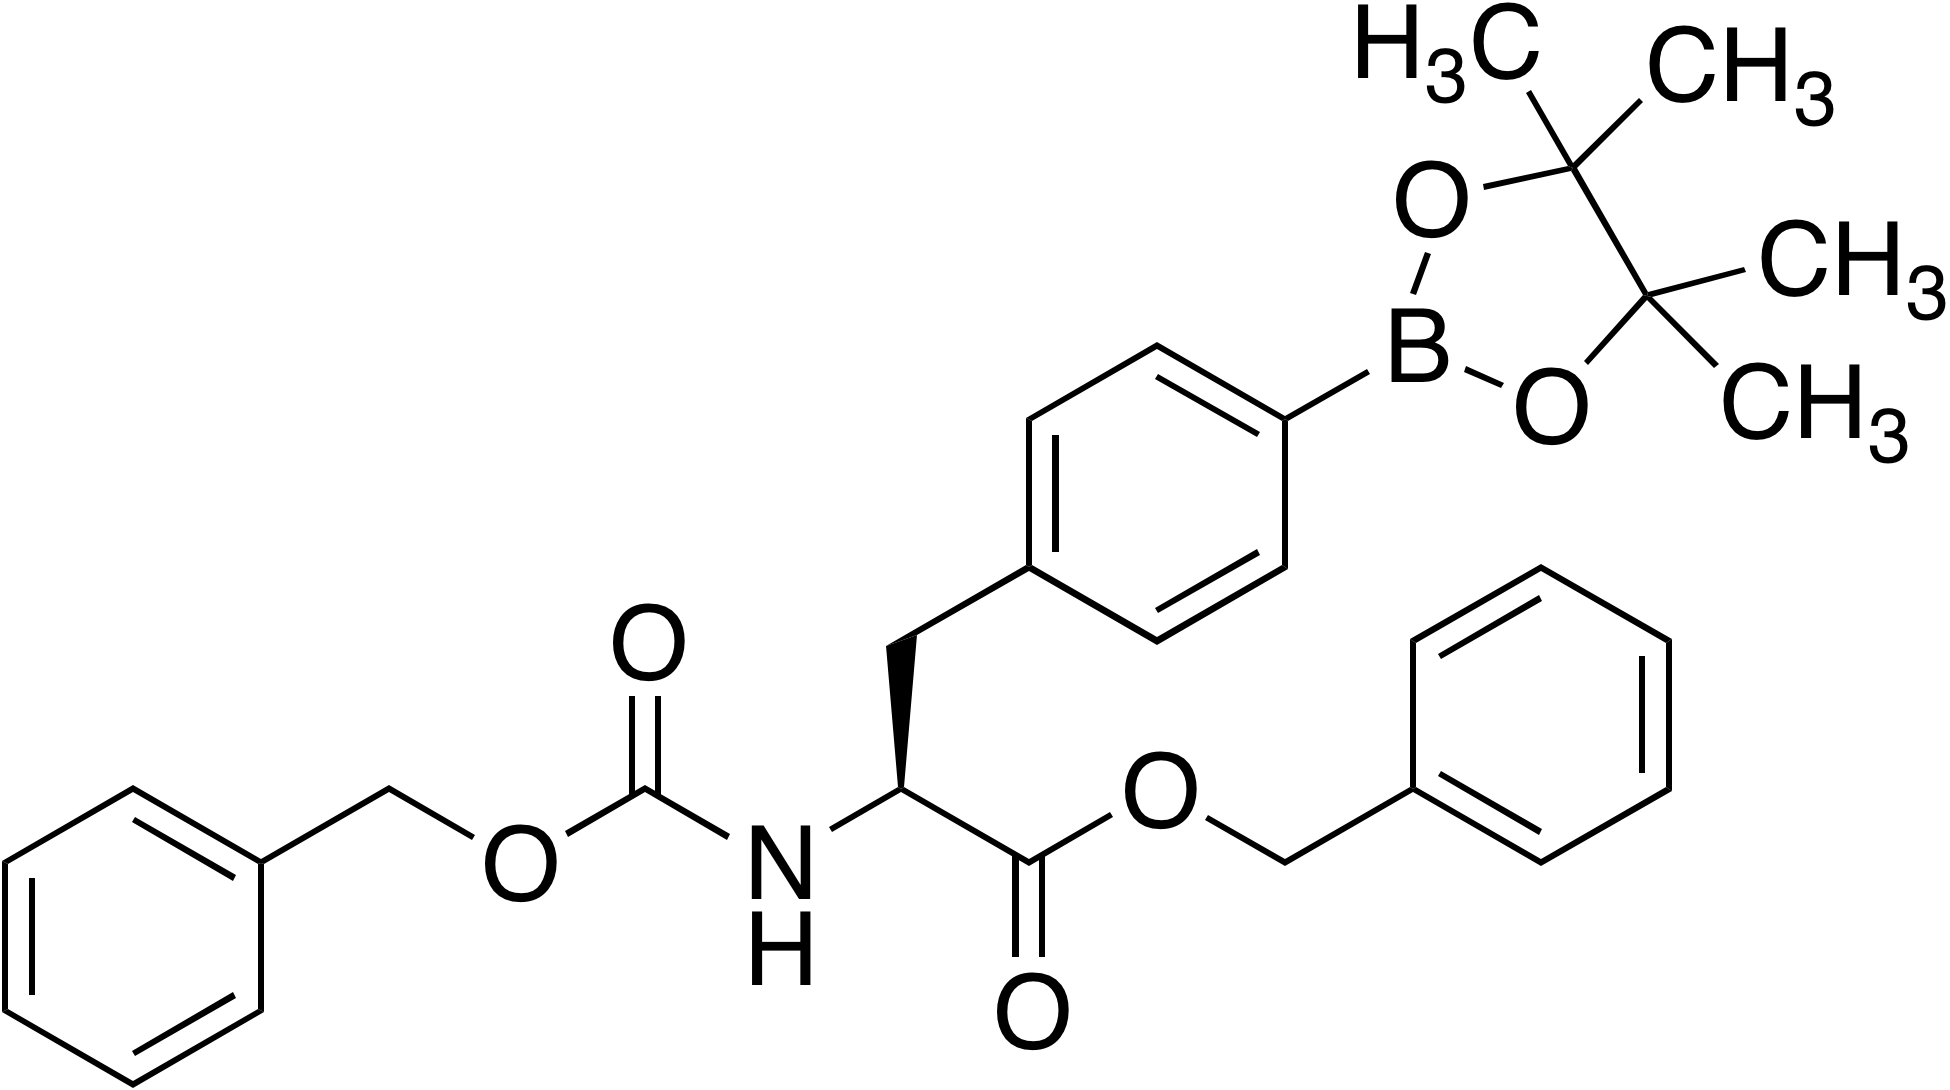 (S)-4-(3-(Benzyloxy)-2-(benzyloxycarbonylamino)-3-oxopropyl)benzeneboronic acid pinacol ester